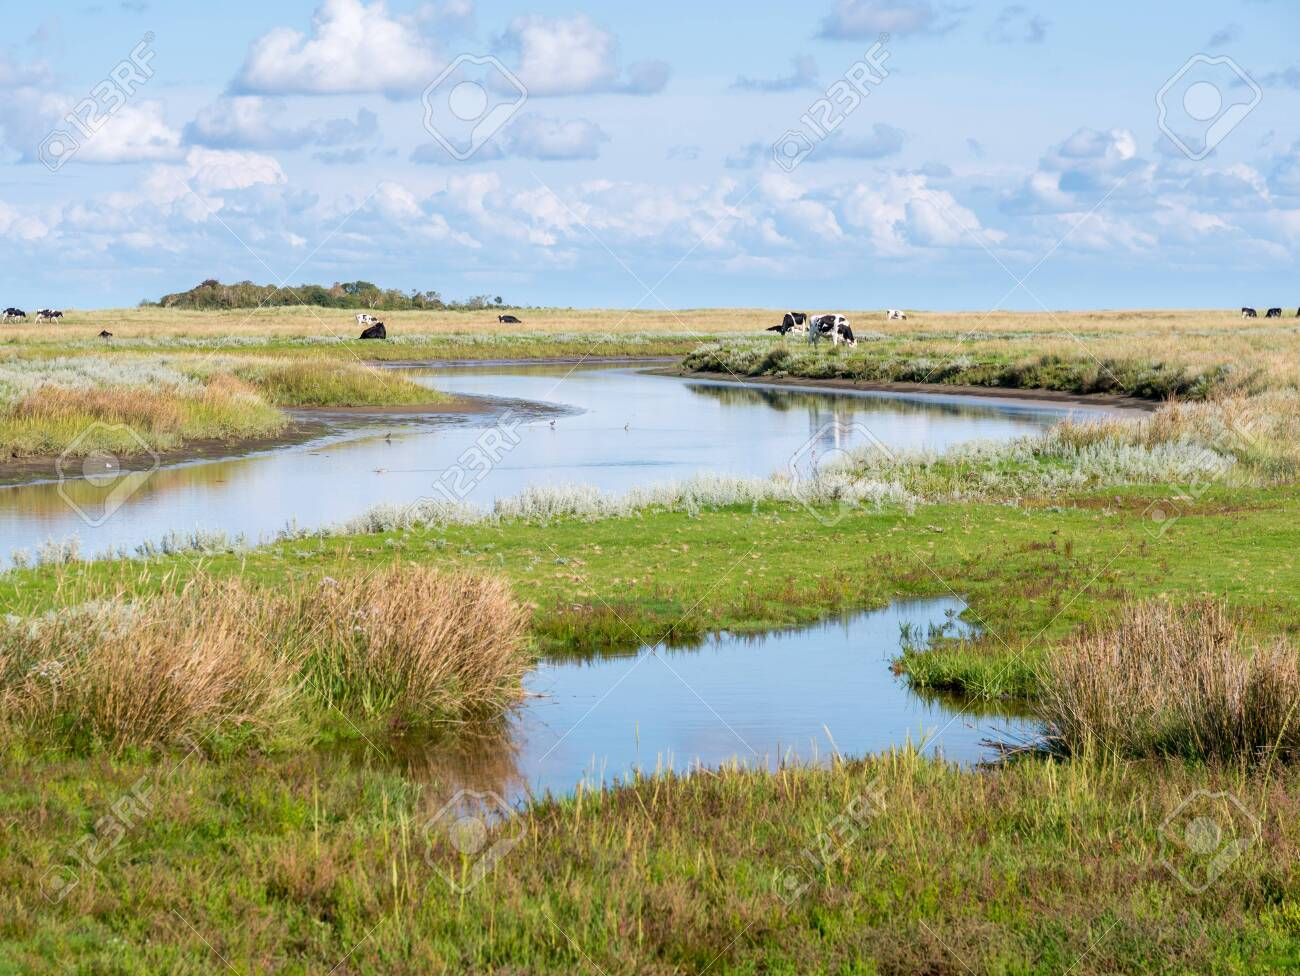 Canal and grazing cows in salt marsh near Kobbeduinen on Frisian island Schiermonnikoog, Netherlands - 134103172